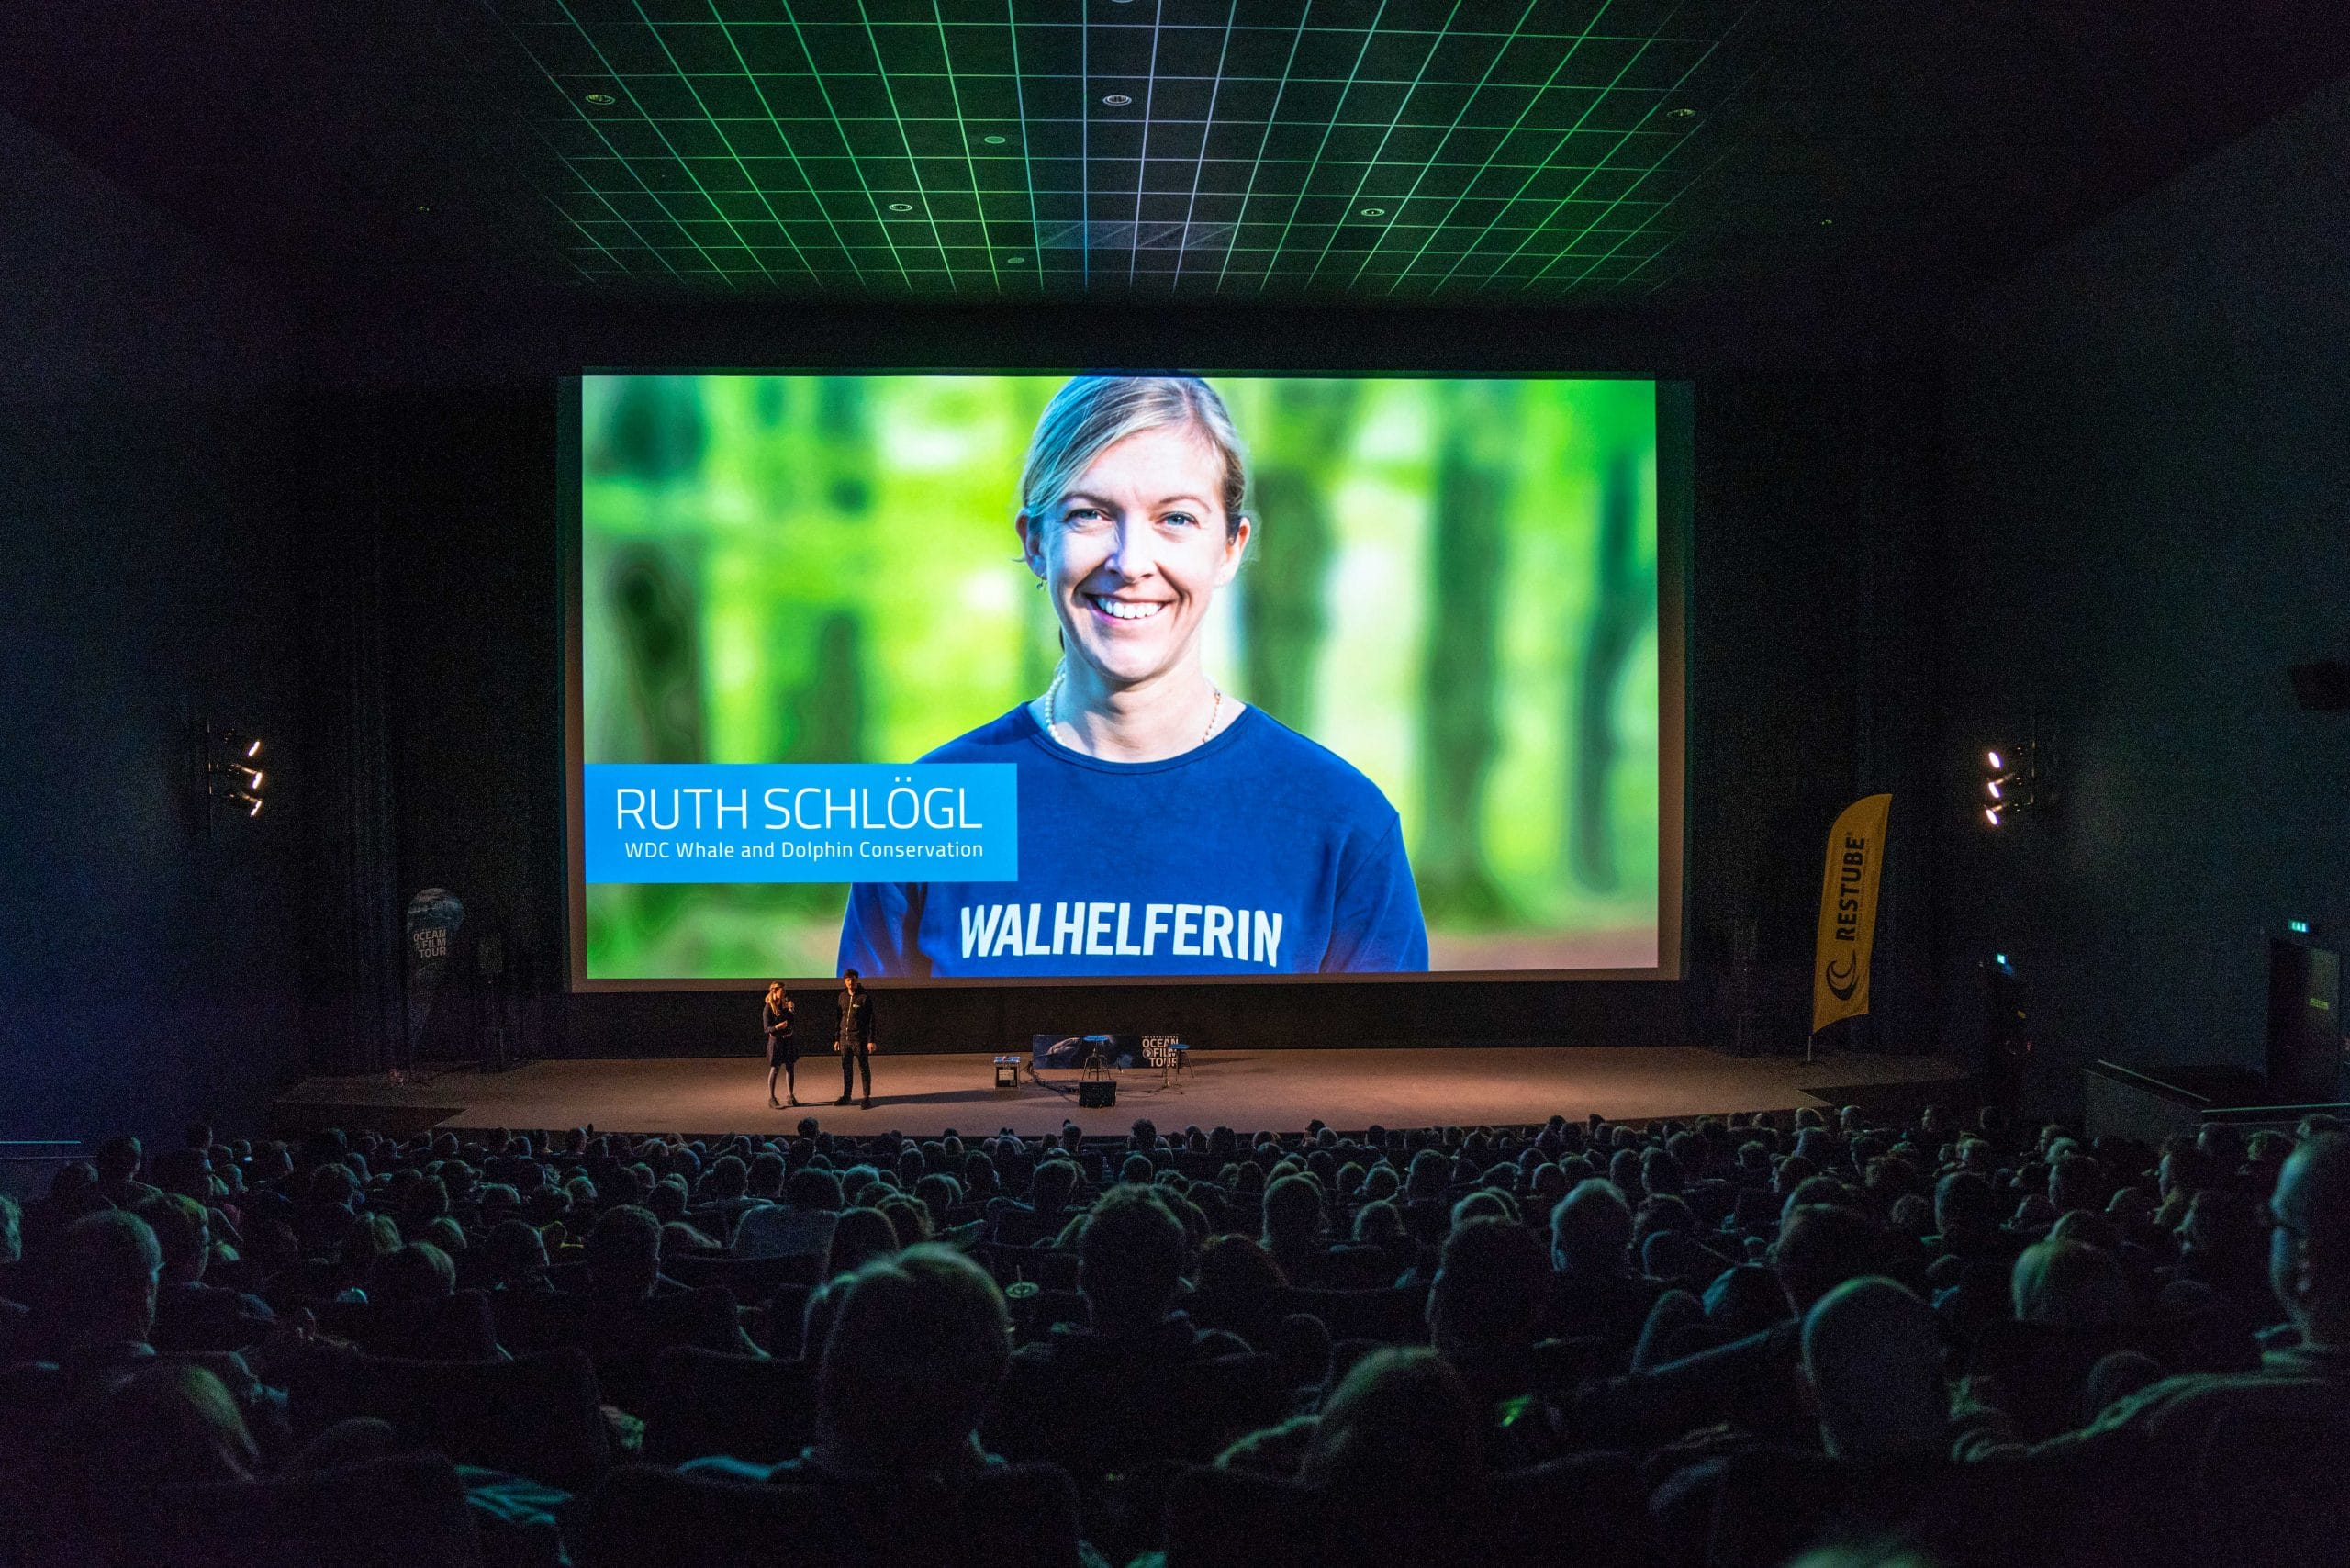 (C) International Ocean Film Tour/Paul Rothenburg